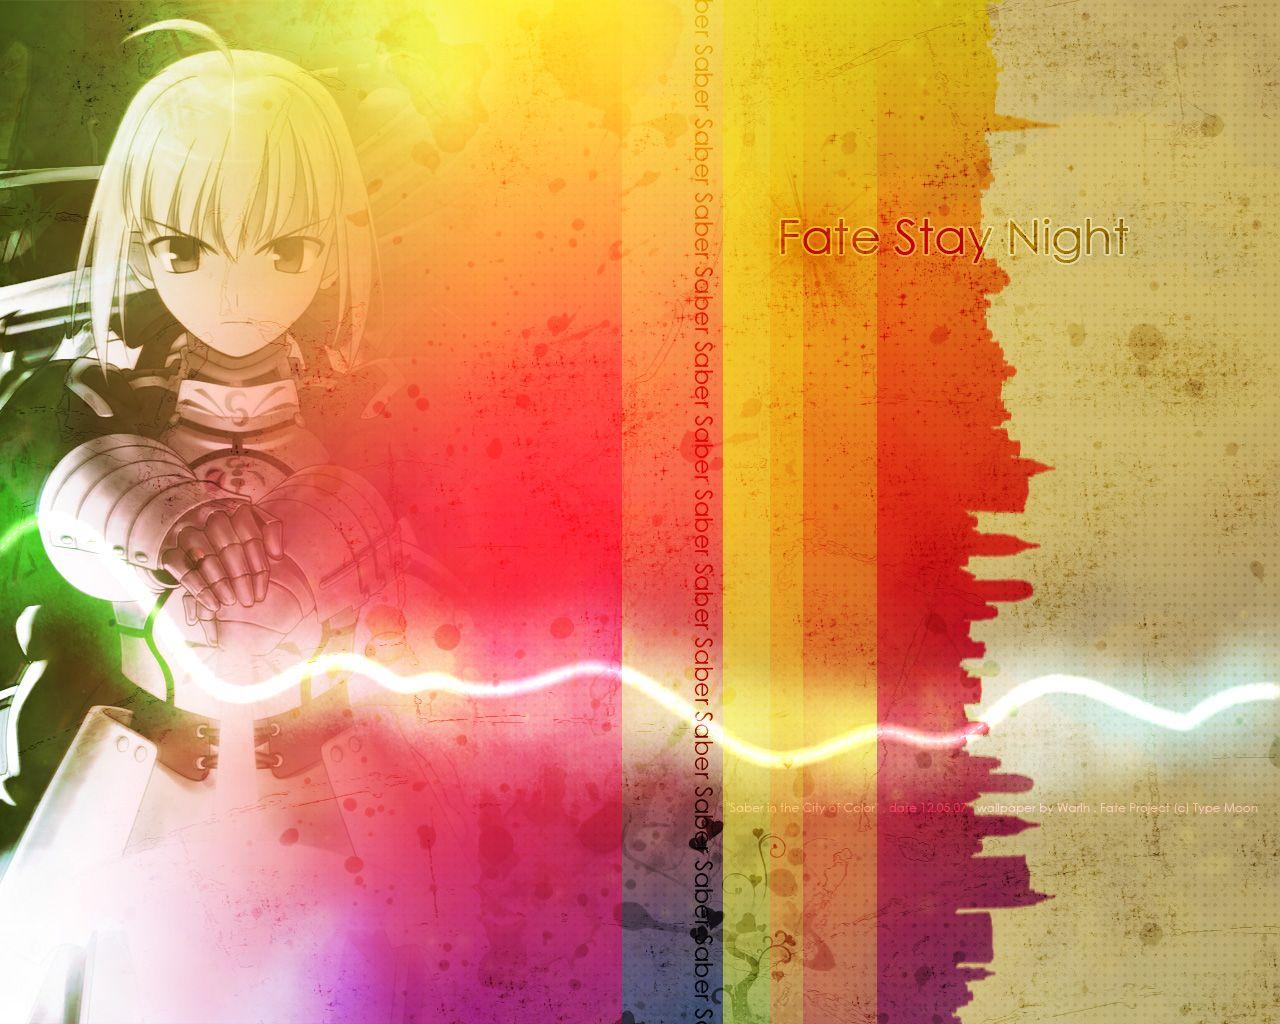 Minitokyo_Fate-Stay_Night_Wallpapers_292725.jpg